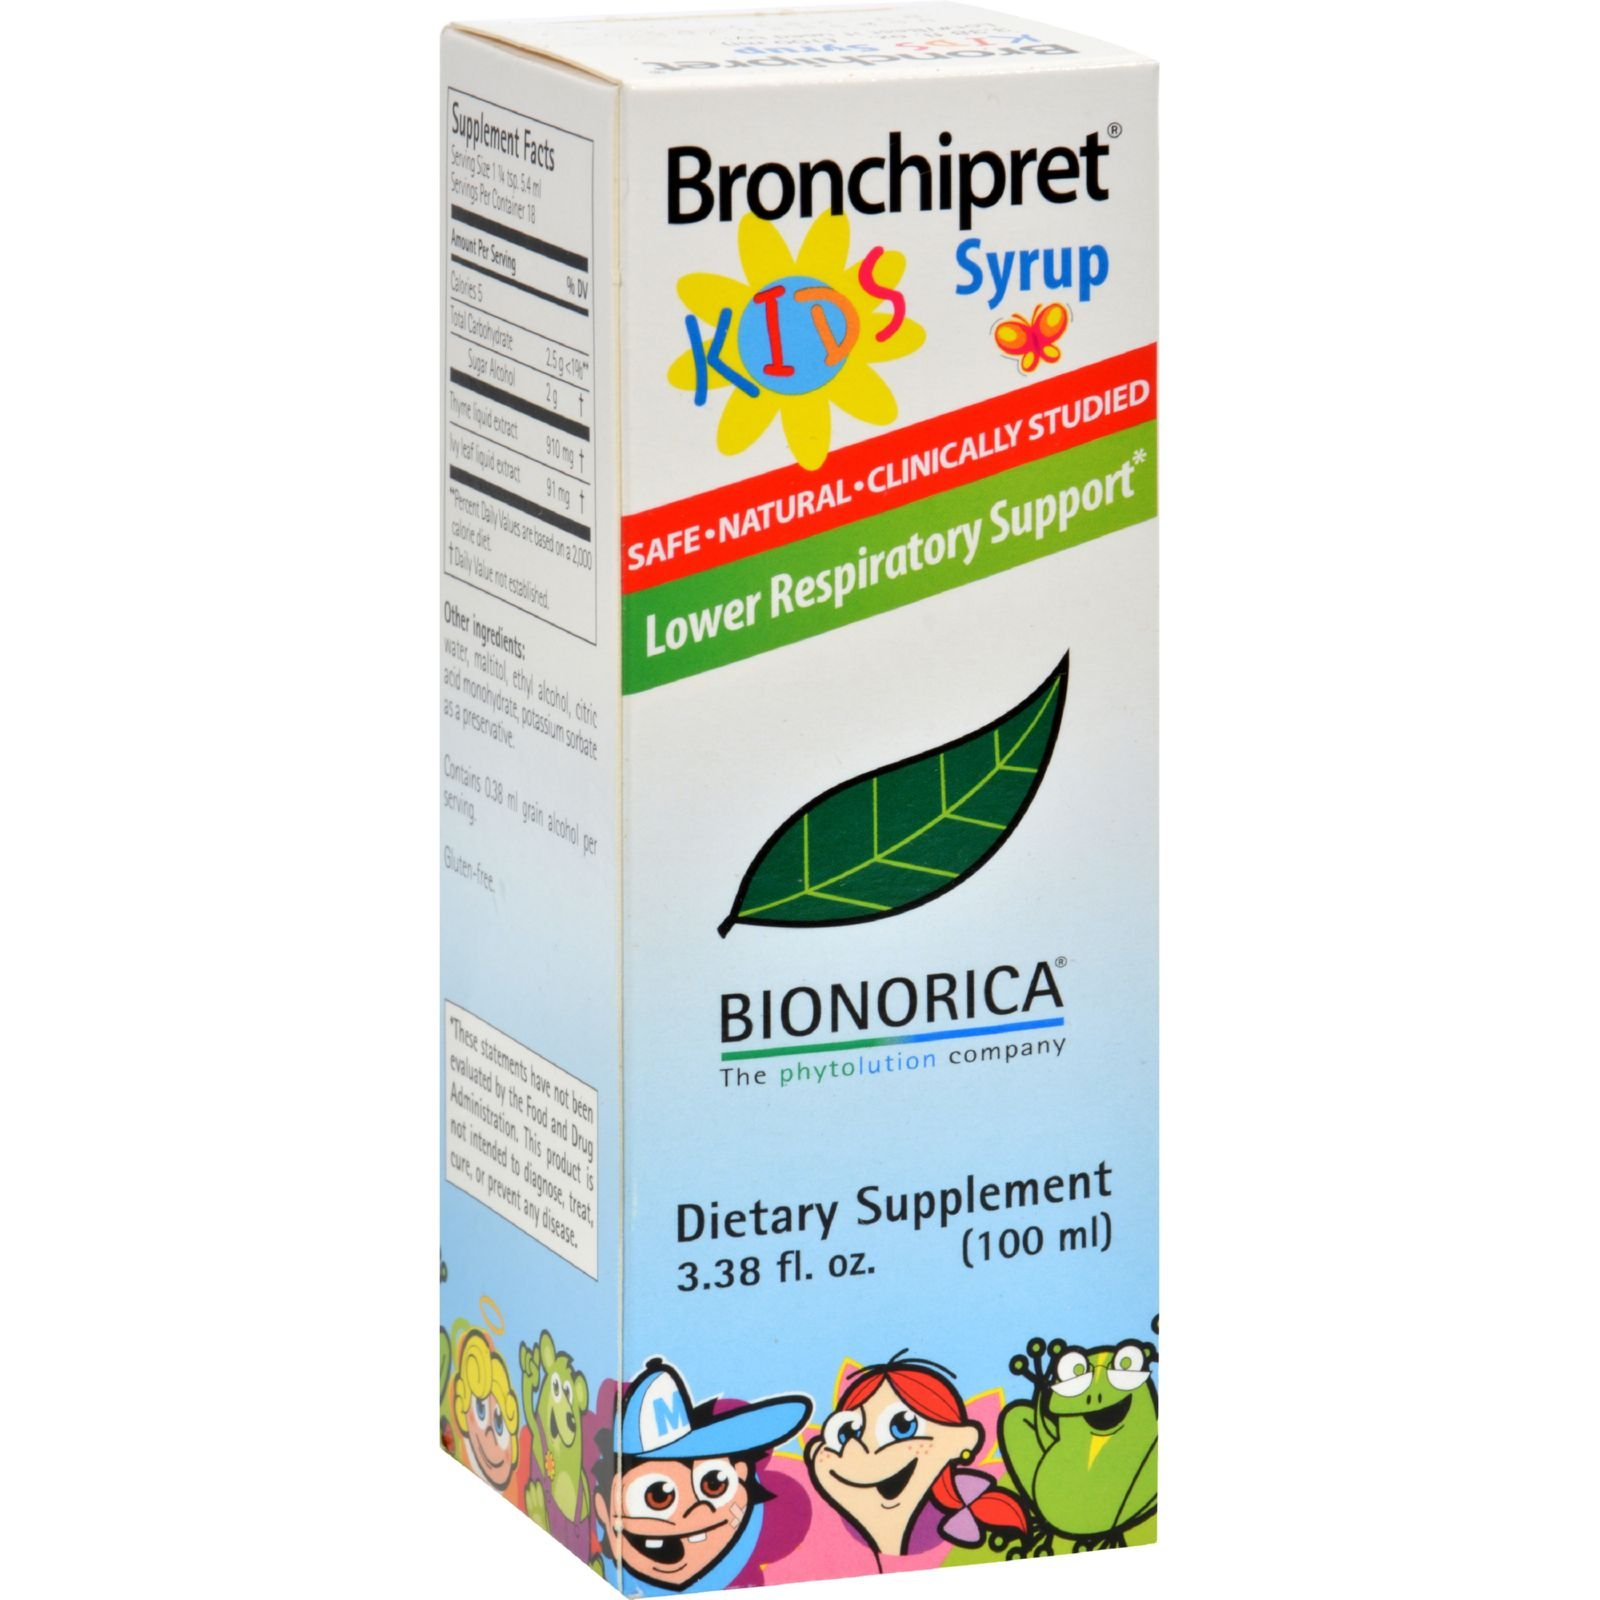 SINUPRET BY BIONORICA BRONCHIPRET SYRUP,KIDS, 3.38 FZ